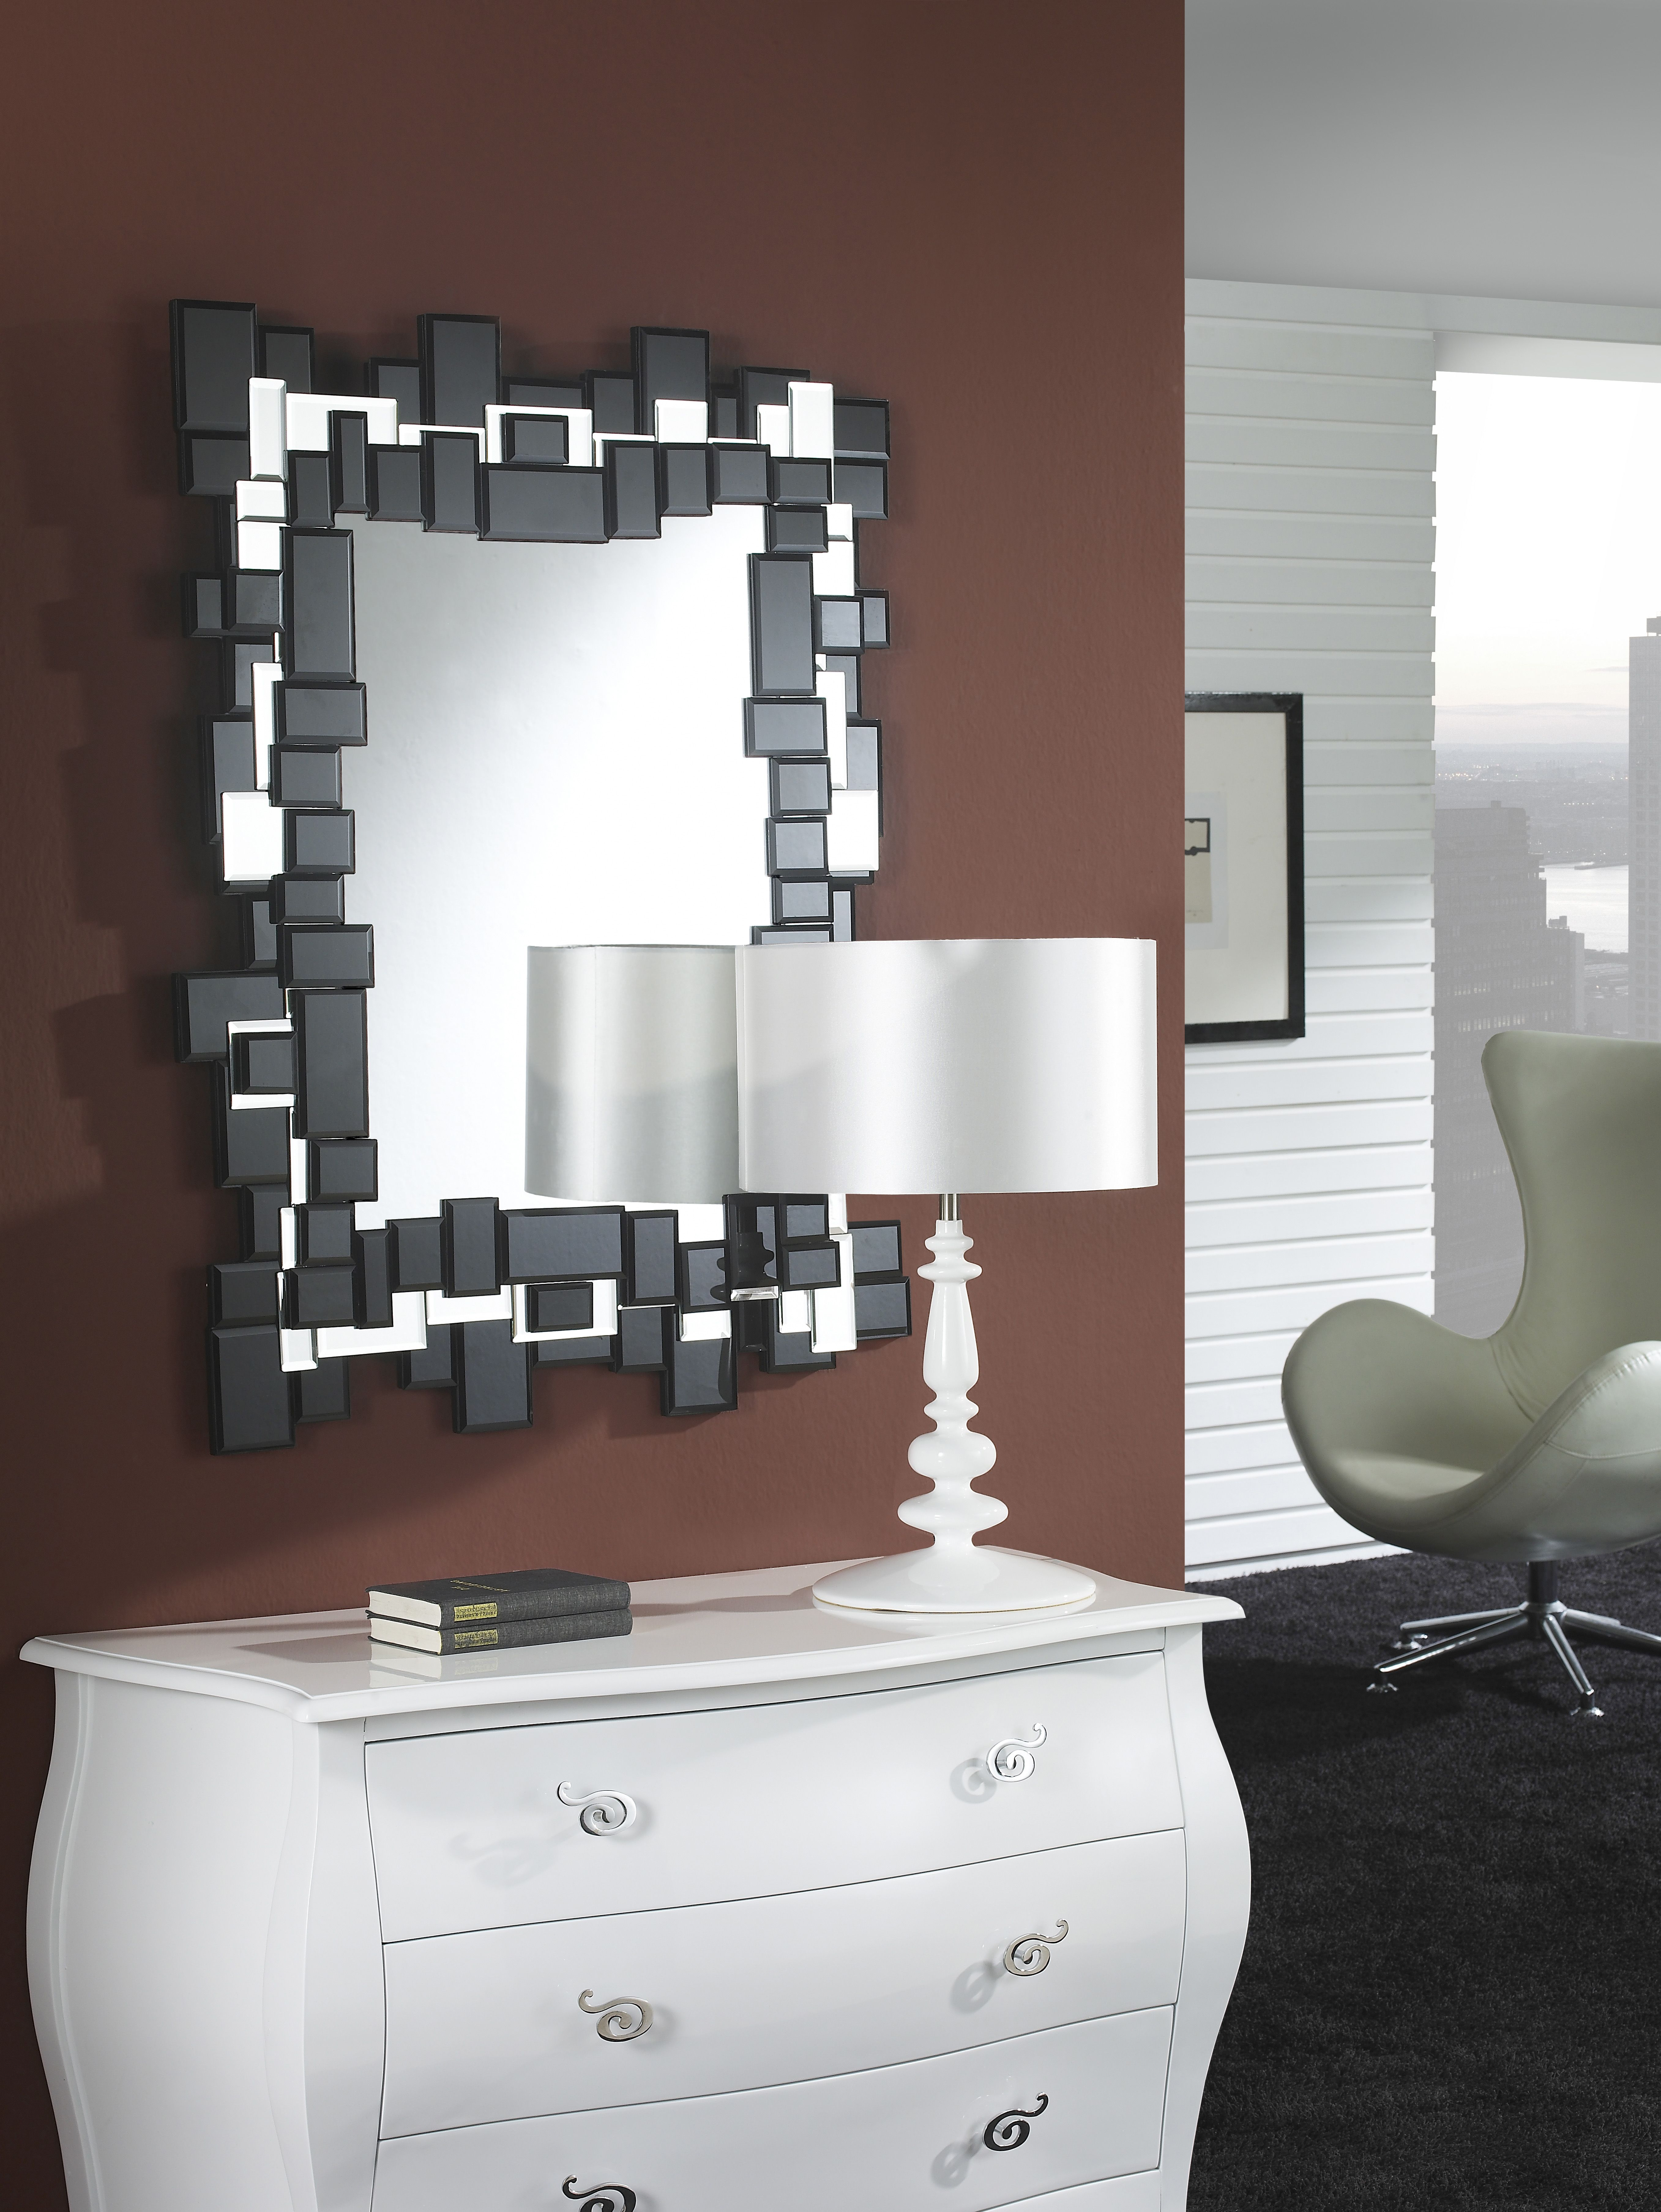 Espejos De Cristal Modernos Espejosmodernos Es Espejos  ~ Espejos Decorativos Segunda Mano